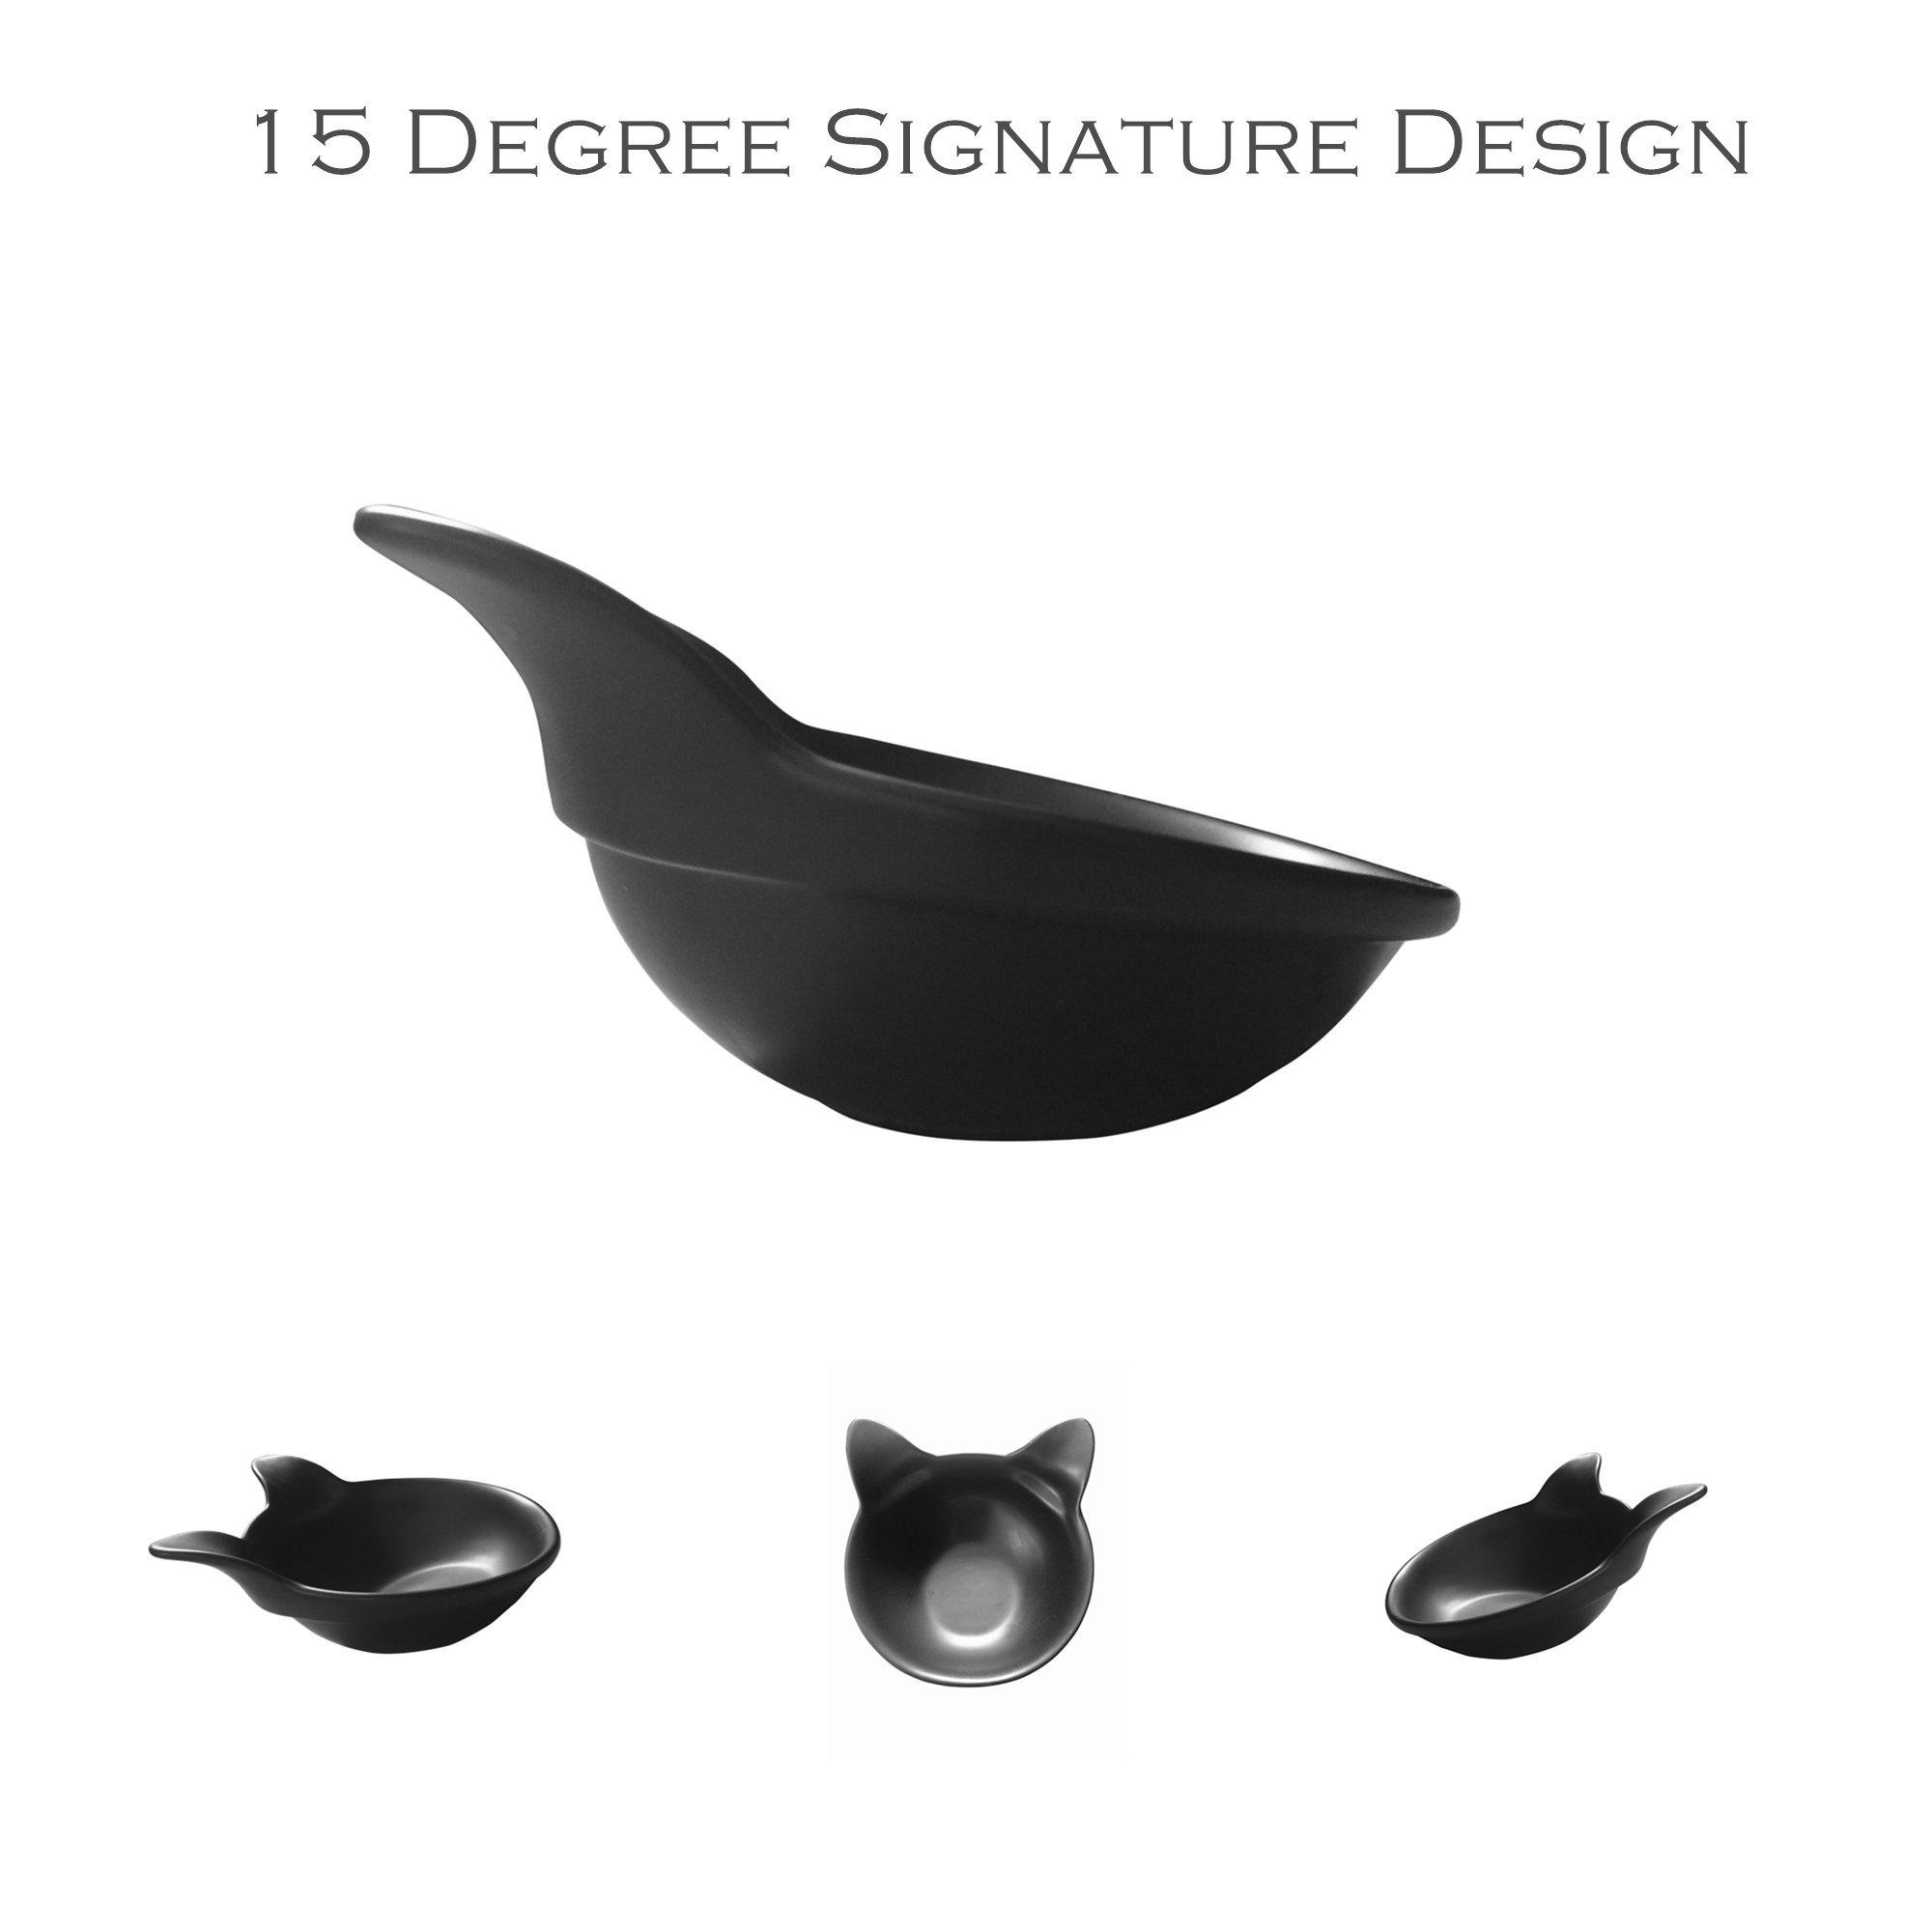 ViviPet 2 Ceramic Kitty Cat Bowls, Pearl Black